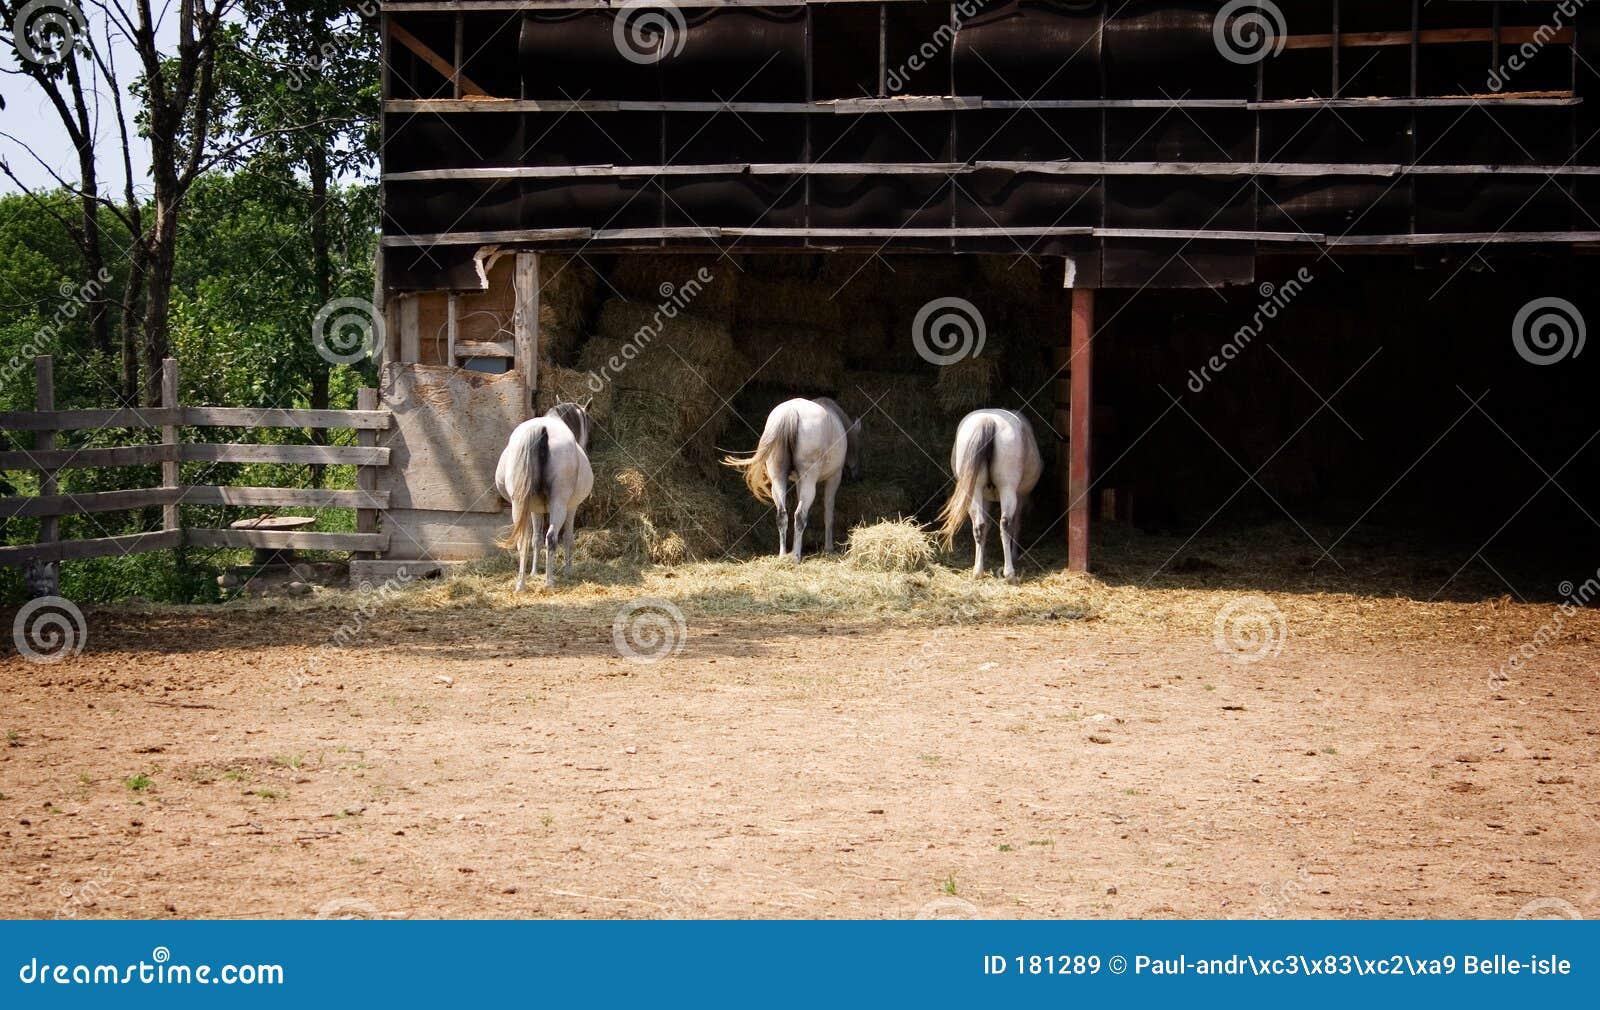 Tres caballos en una granja